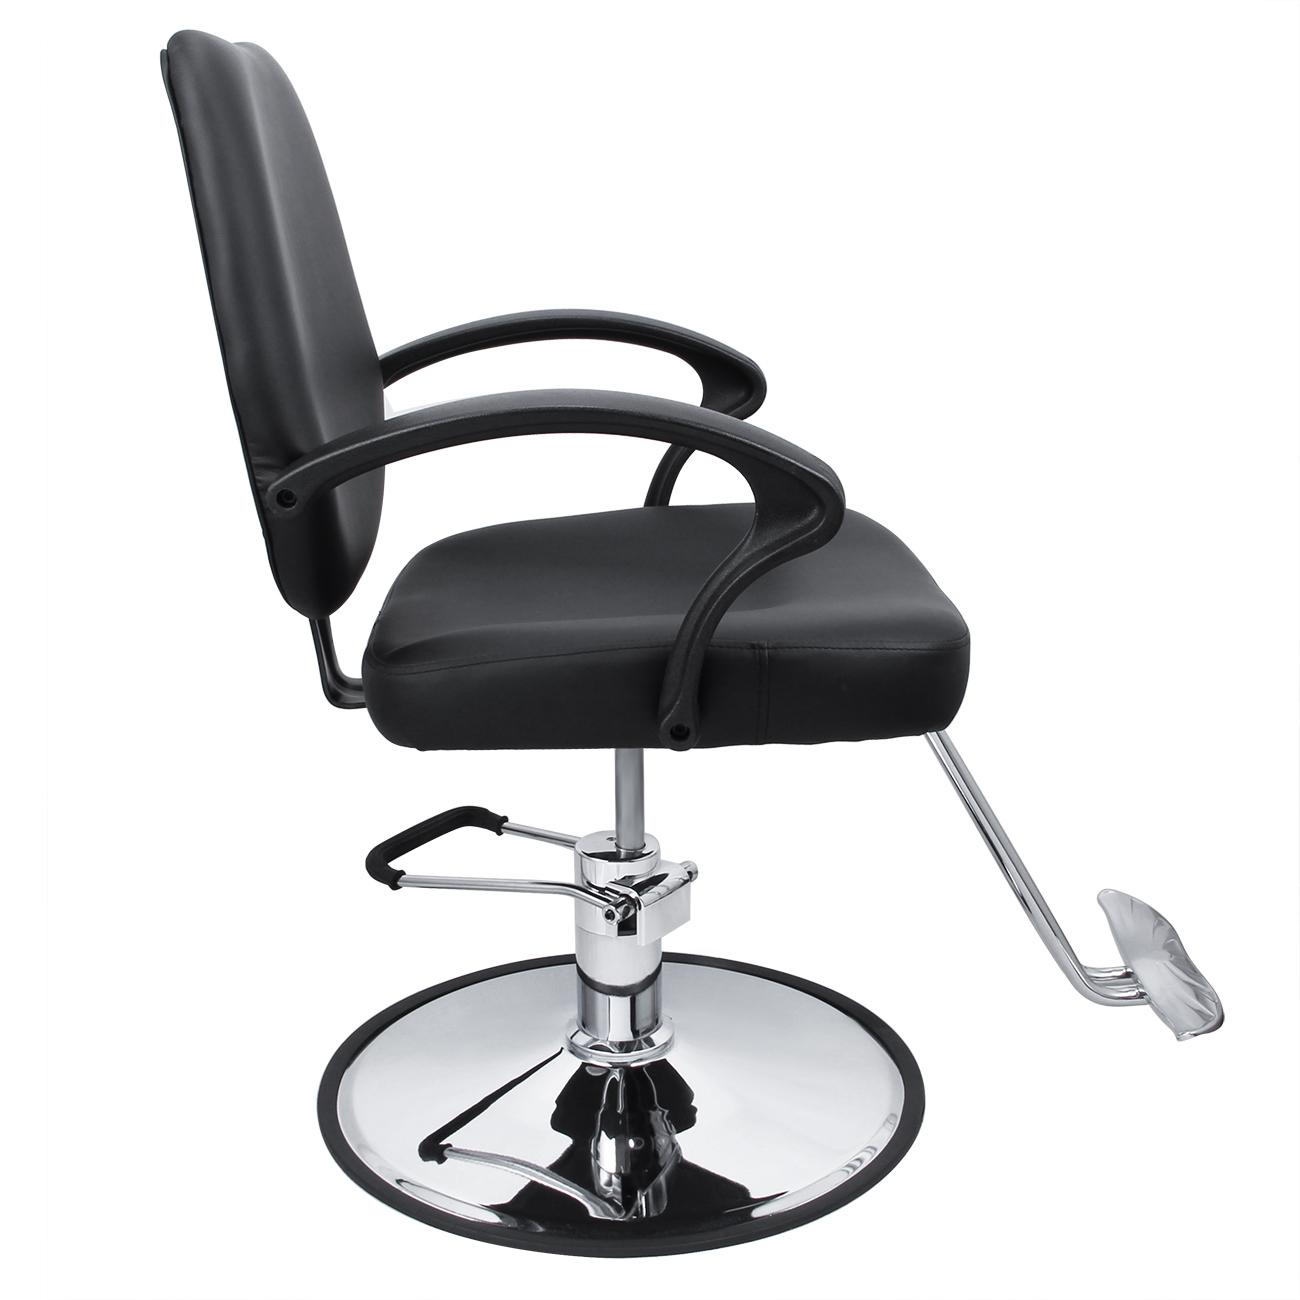 ez chair barber shop covers at walmart classic hydraulic salon beauty spa hair